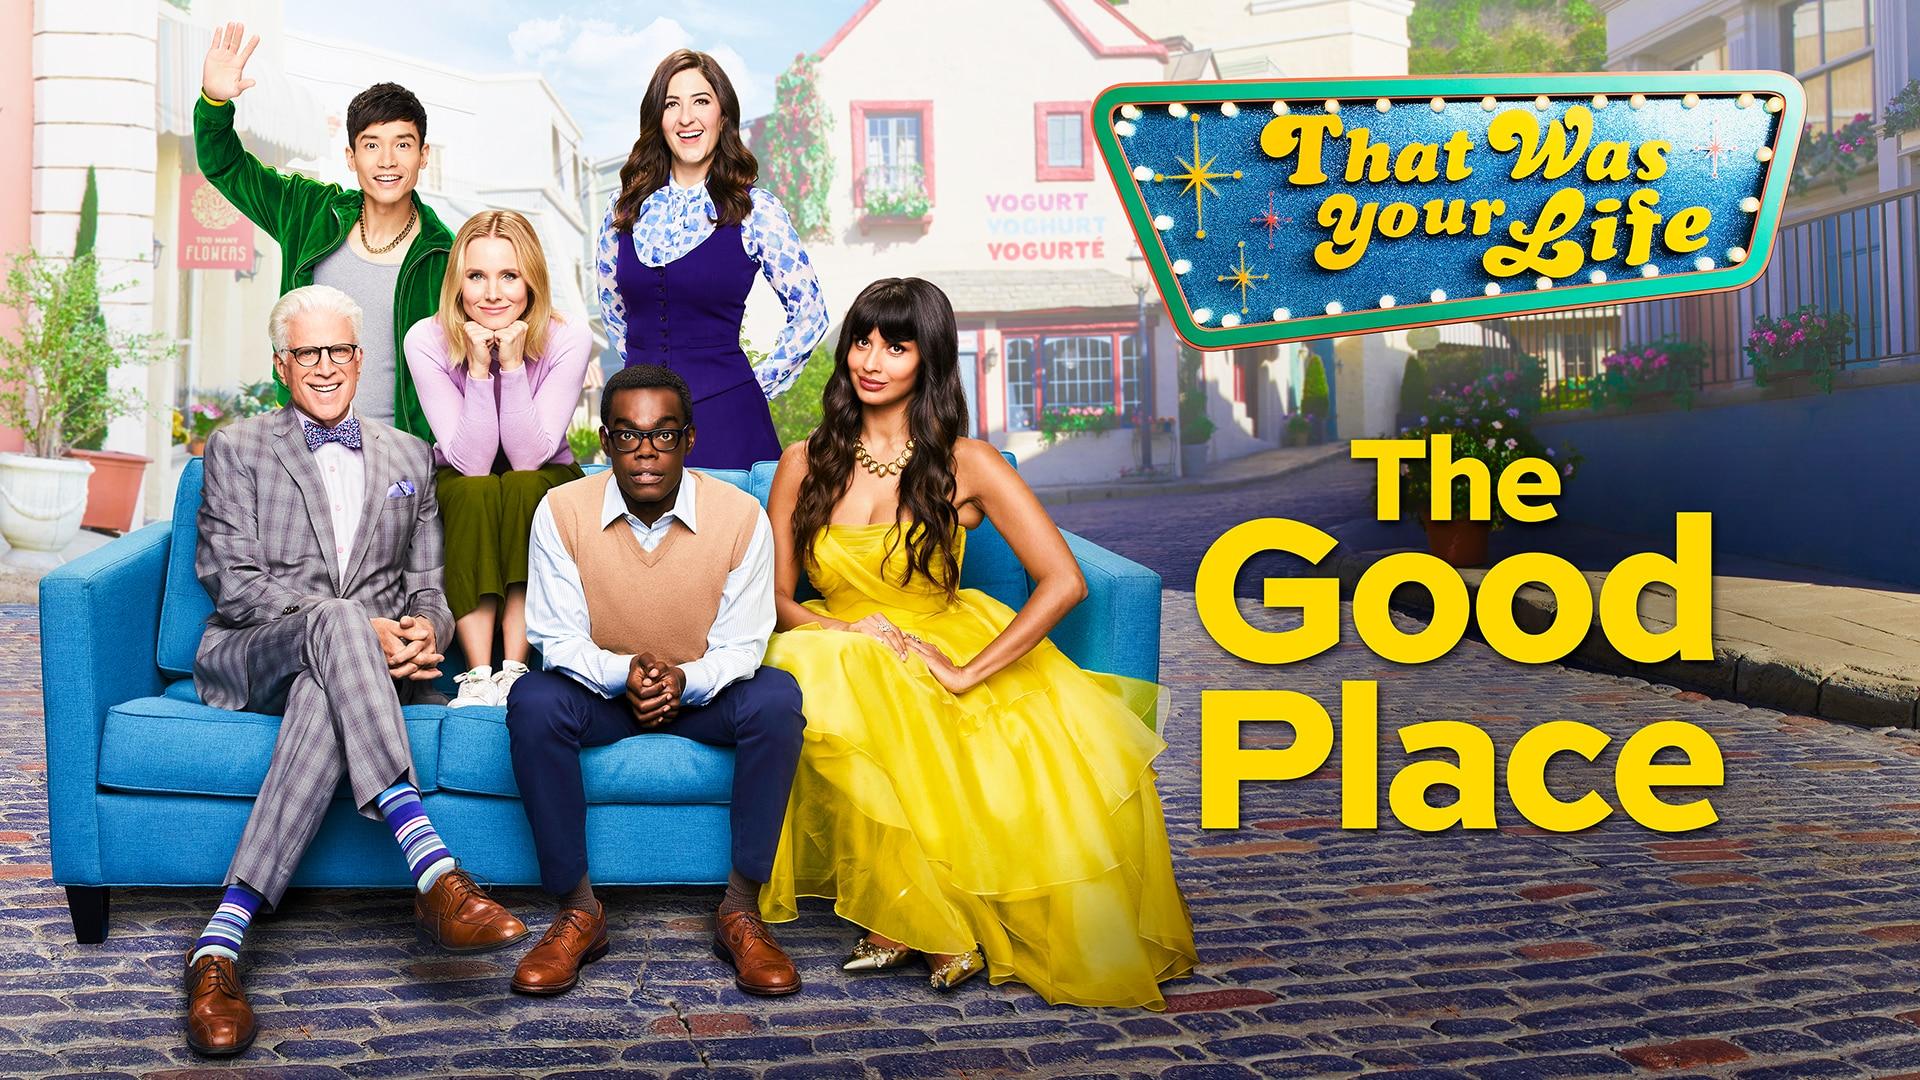 The Good Place Season 2 Episodes - NBC com